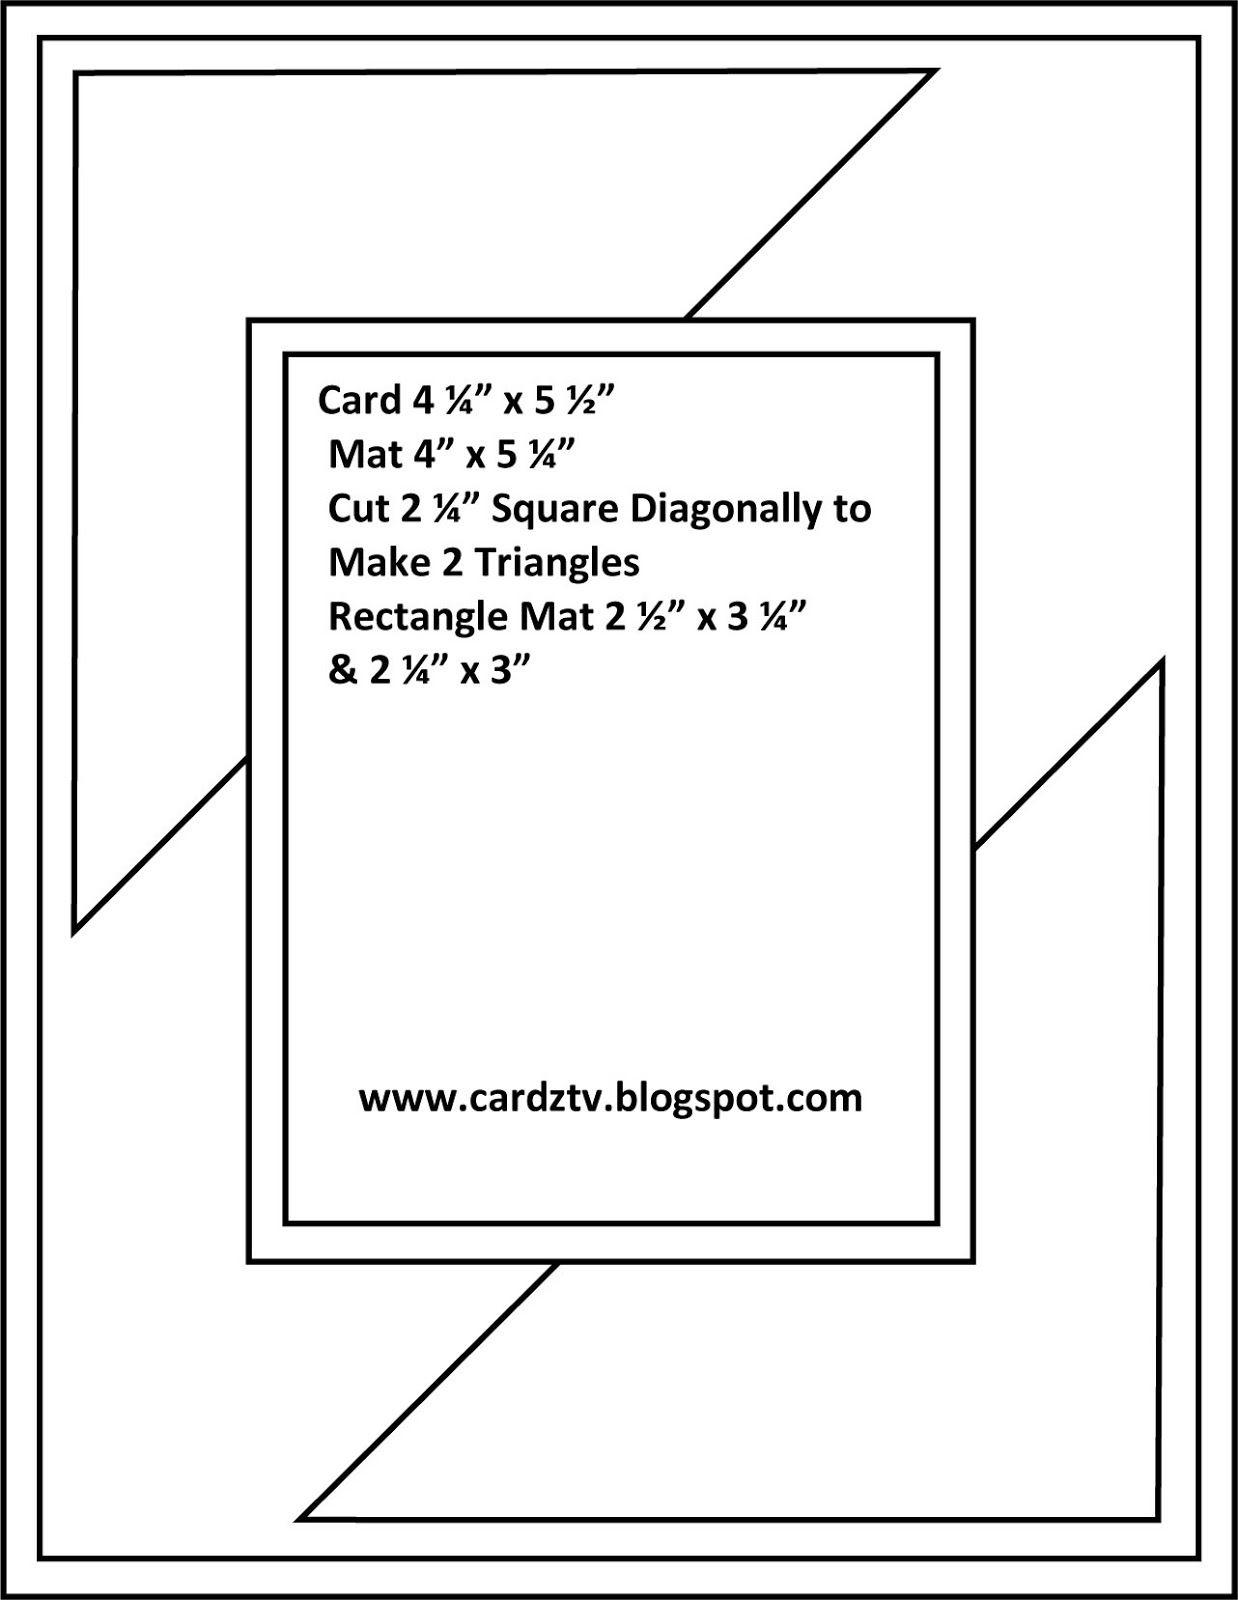 CARDZ TV: CARDZ TV CARD KIT & KABOODLE SKETCH ELEVEN | template ...